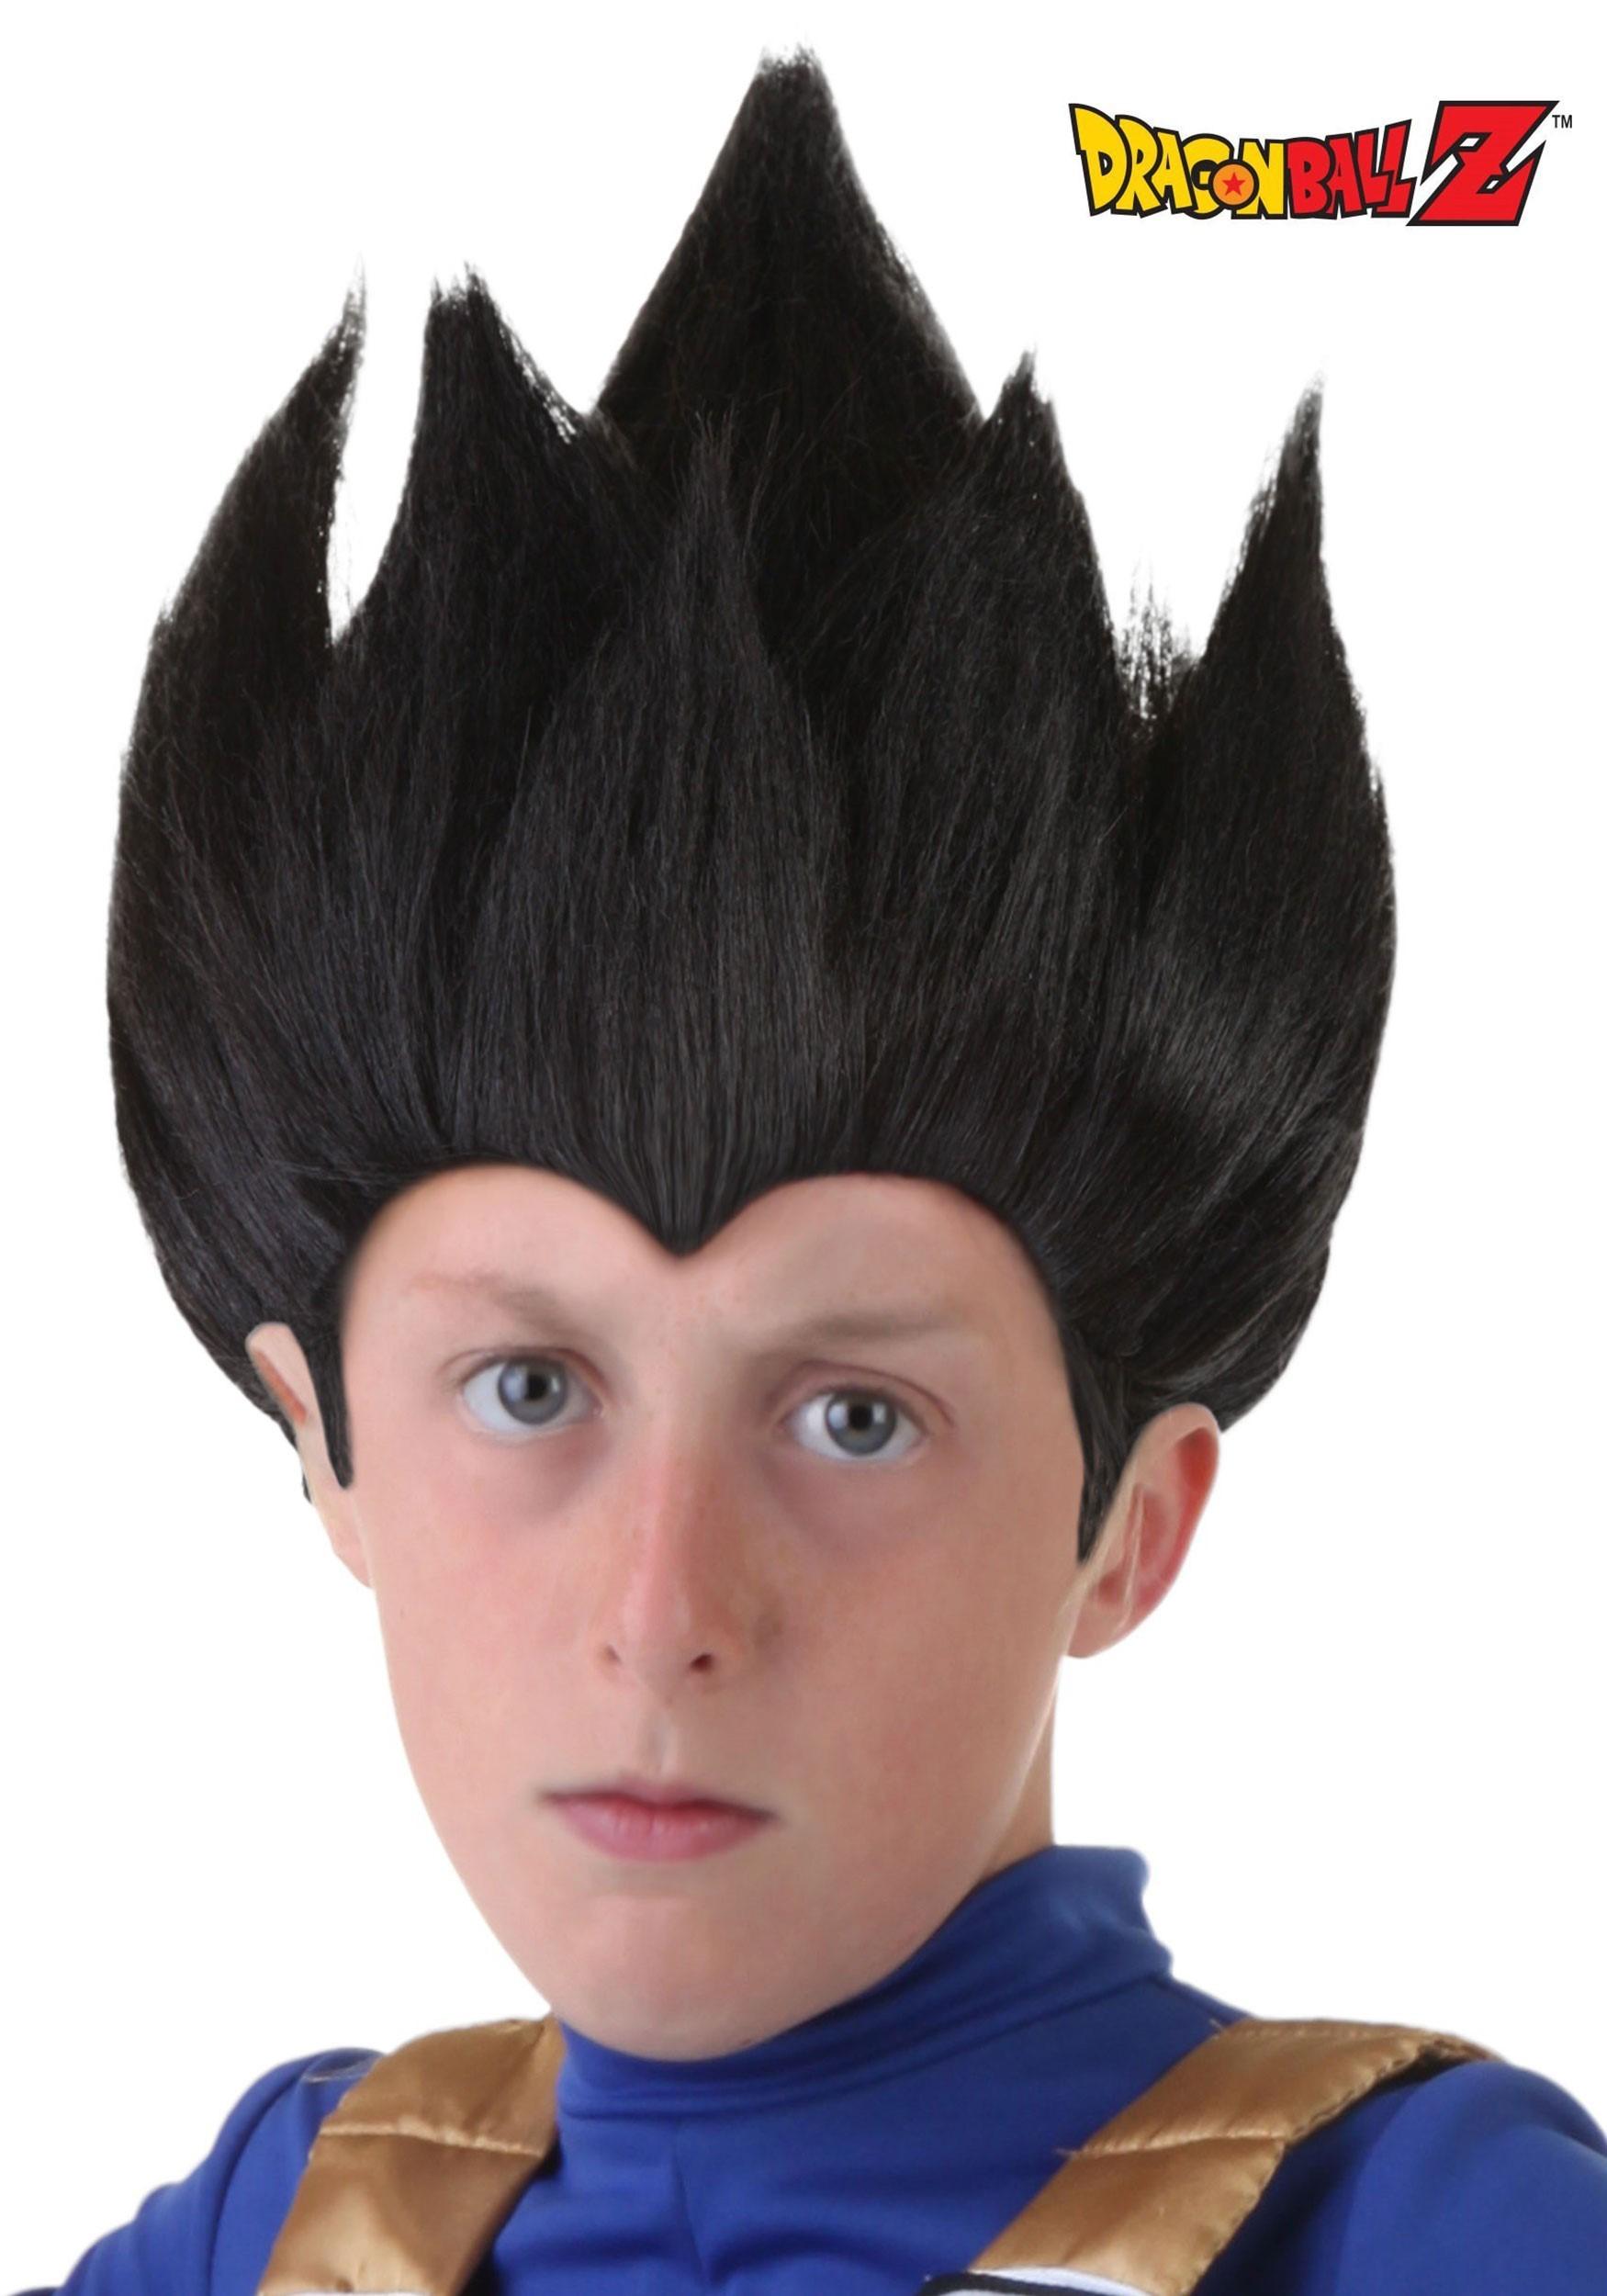 Child Vegeta Wig  sc 1 st  Fun.com & Child Vegeta Wig from Dragon Ball Z